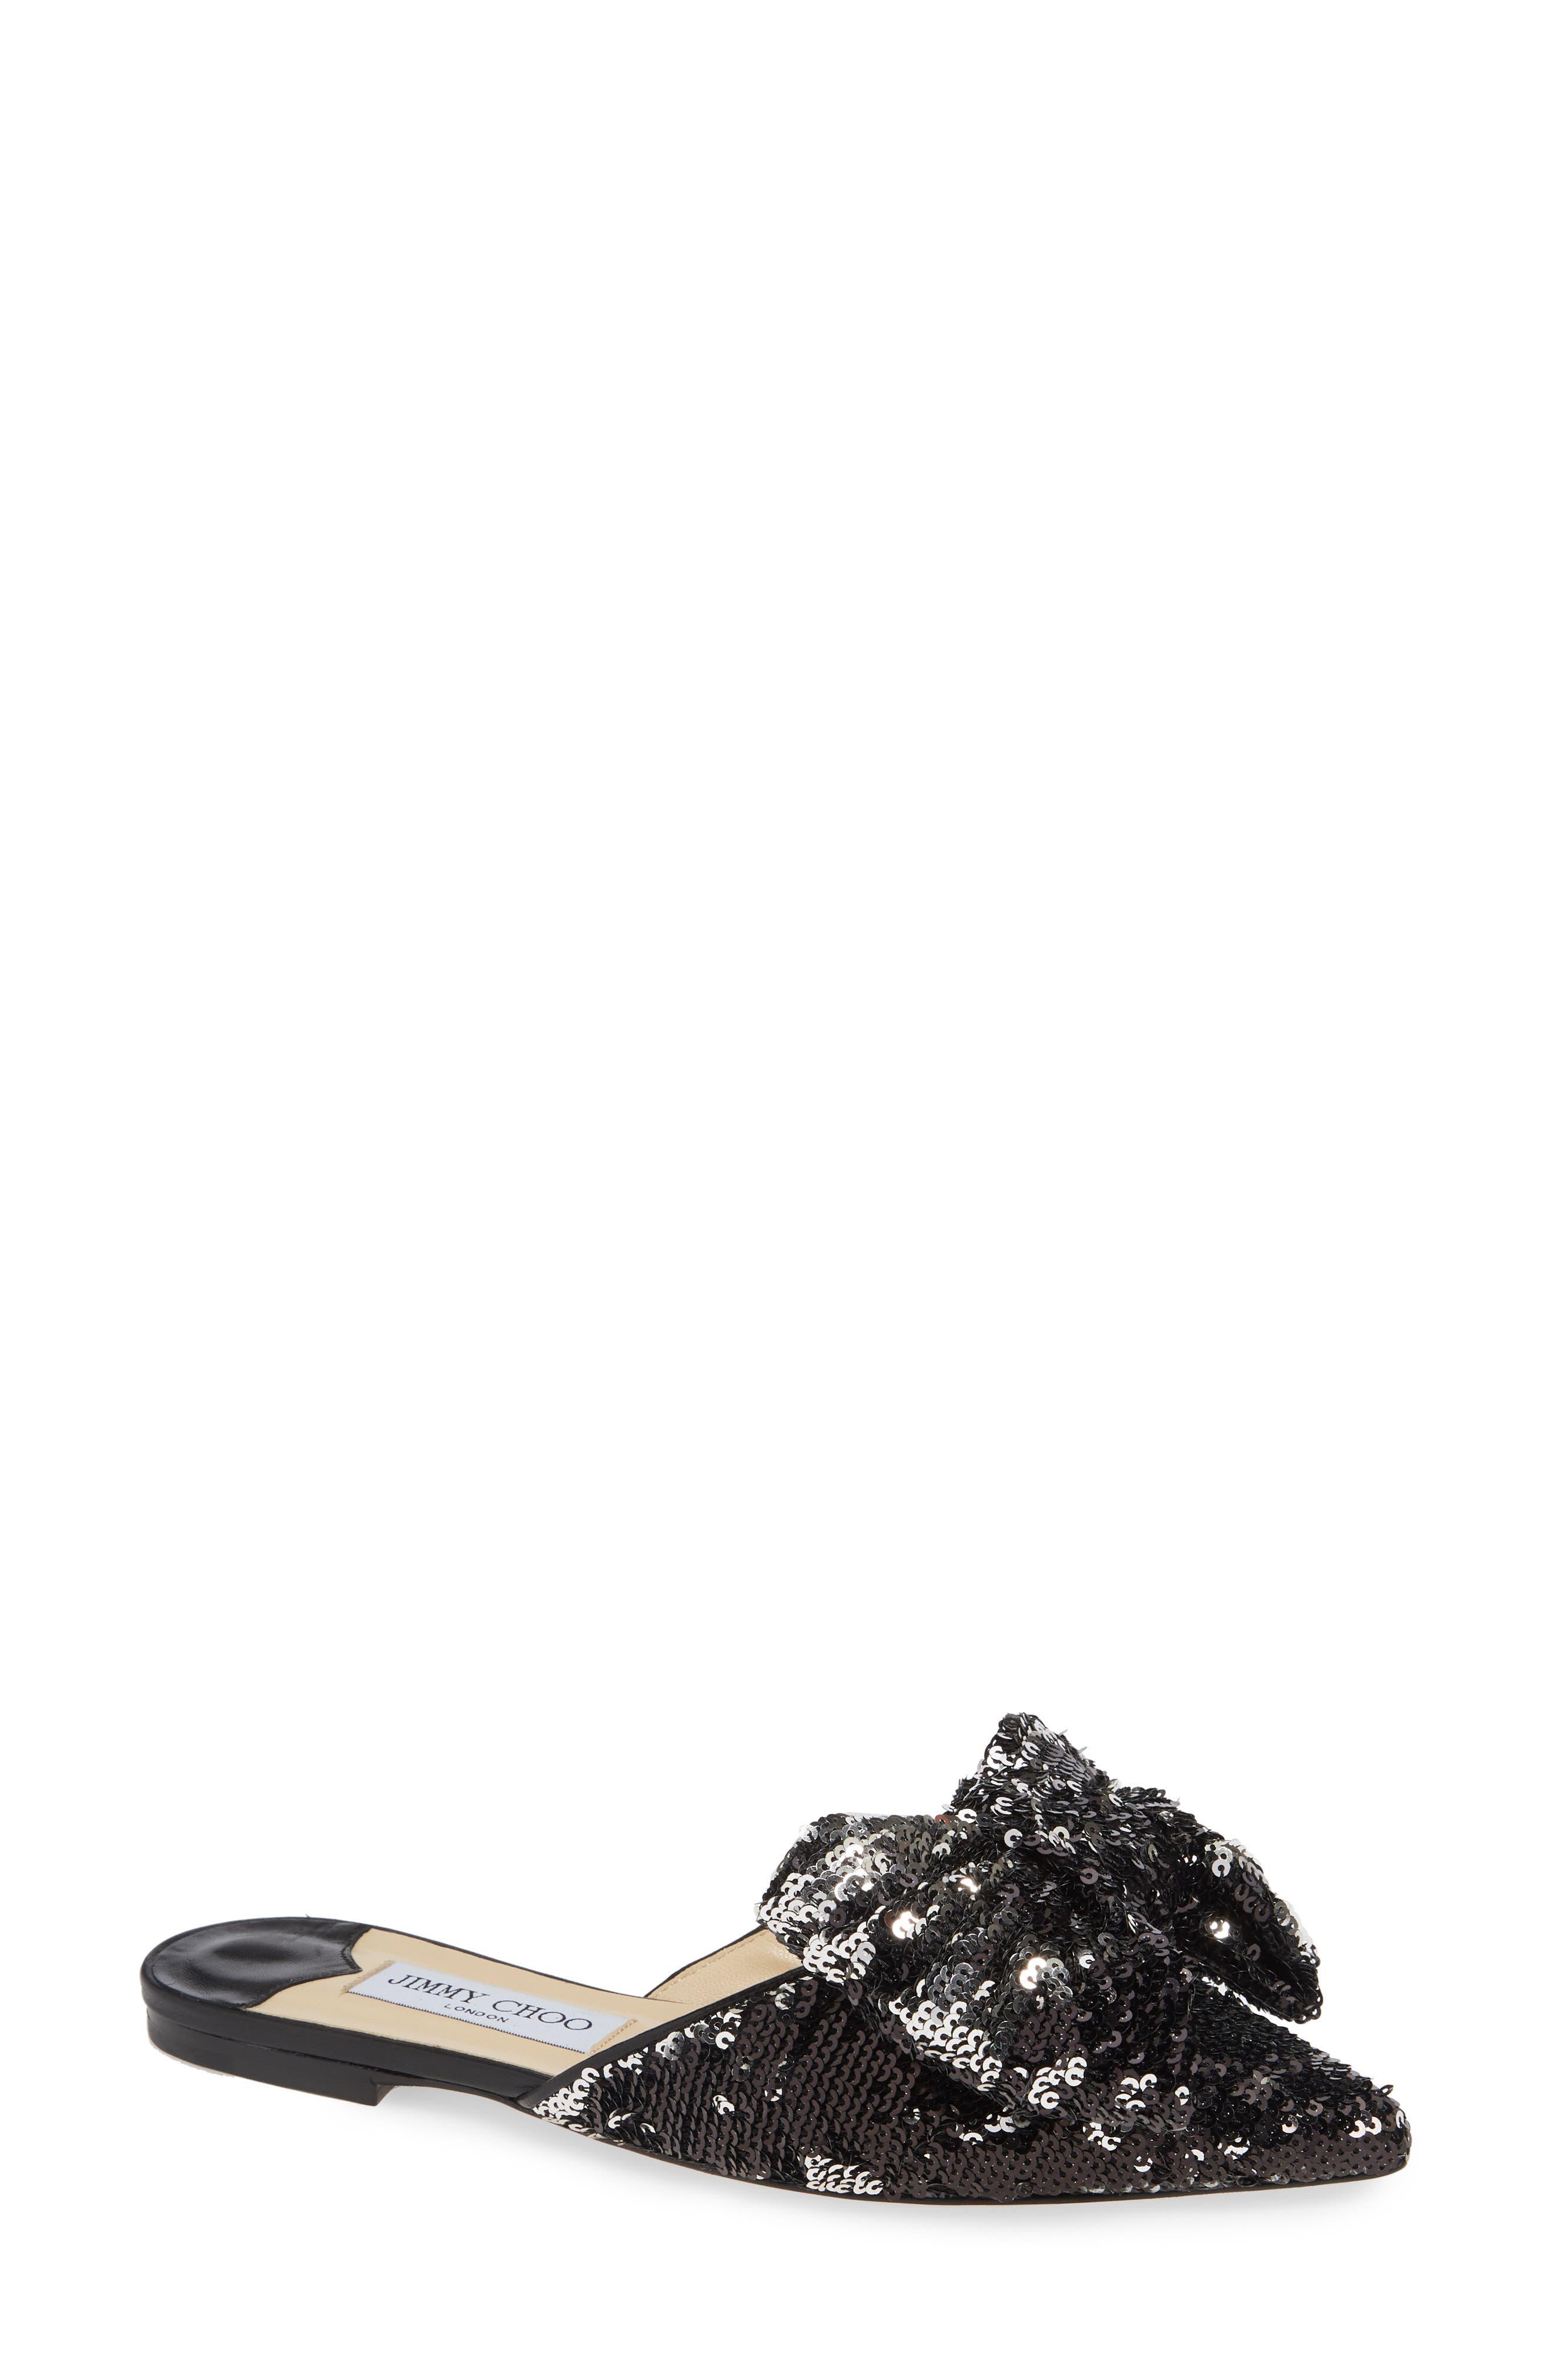 Georgia Sequin Bow Mule, Main, color, BLACK/ SILVER